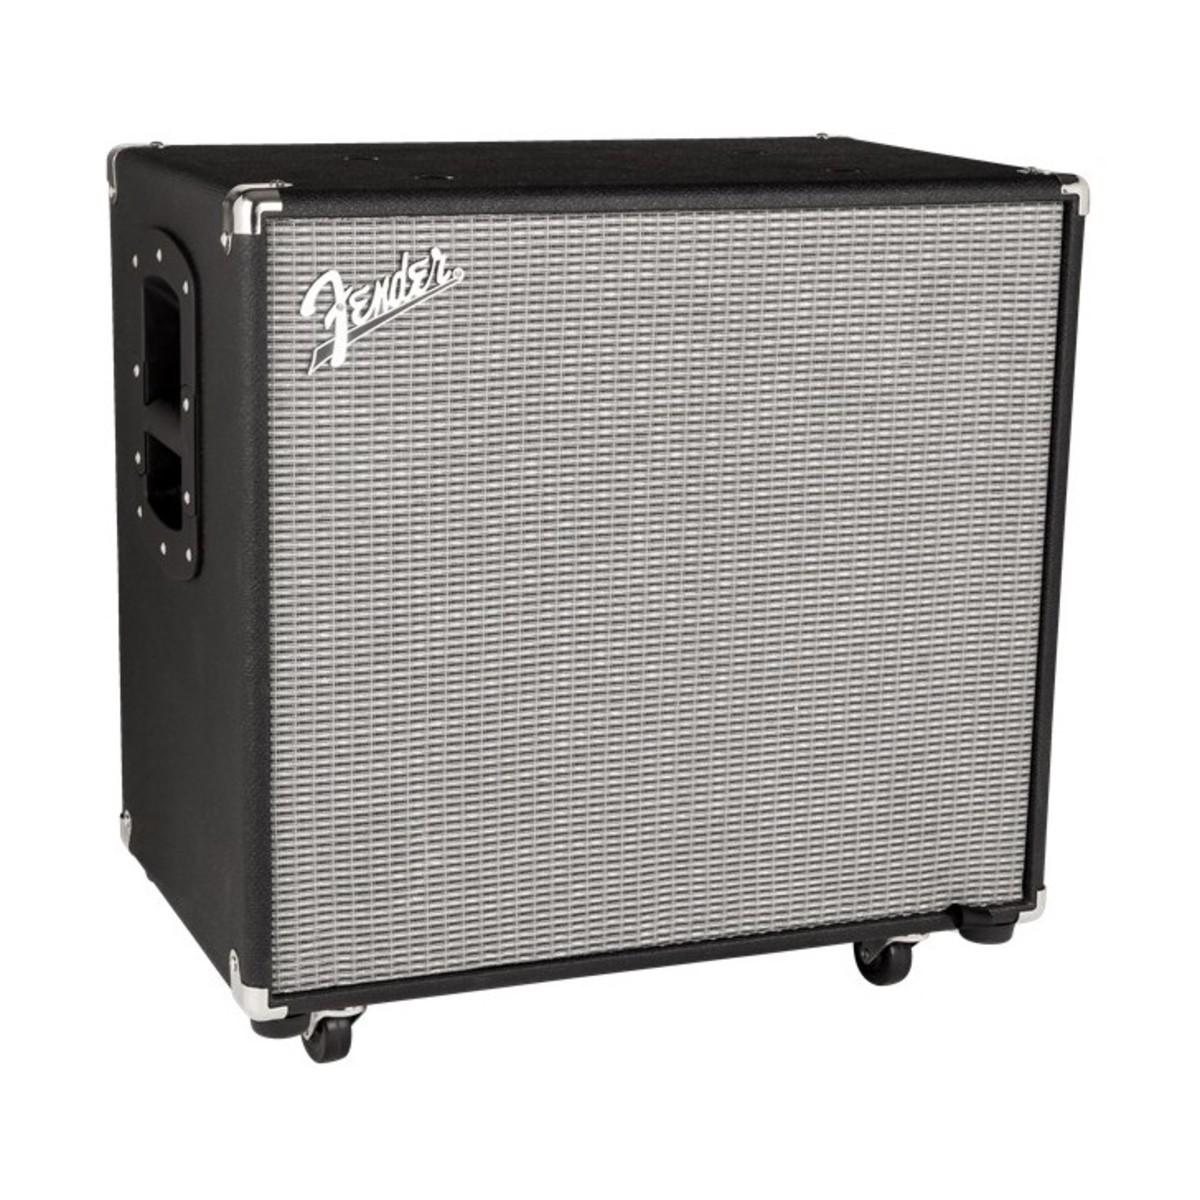 fender rumble 115 bass cabinet black silver at gear4music. Black Bedroom Furniture Sets. Home Design Ideas